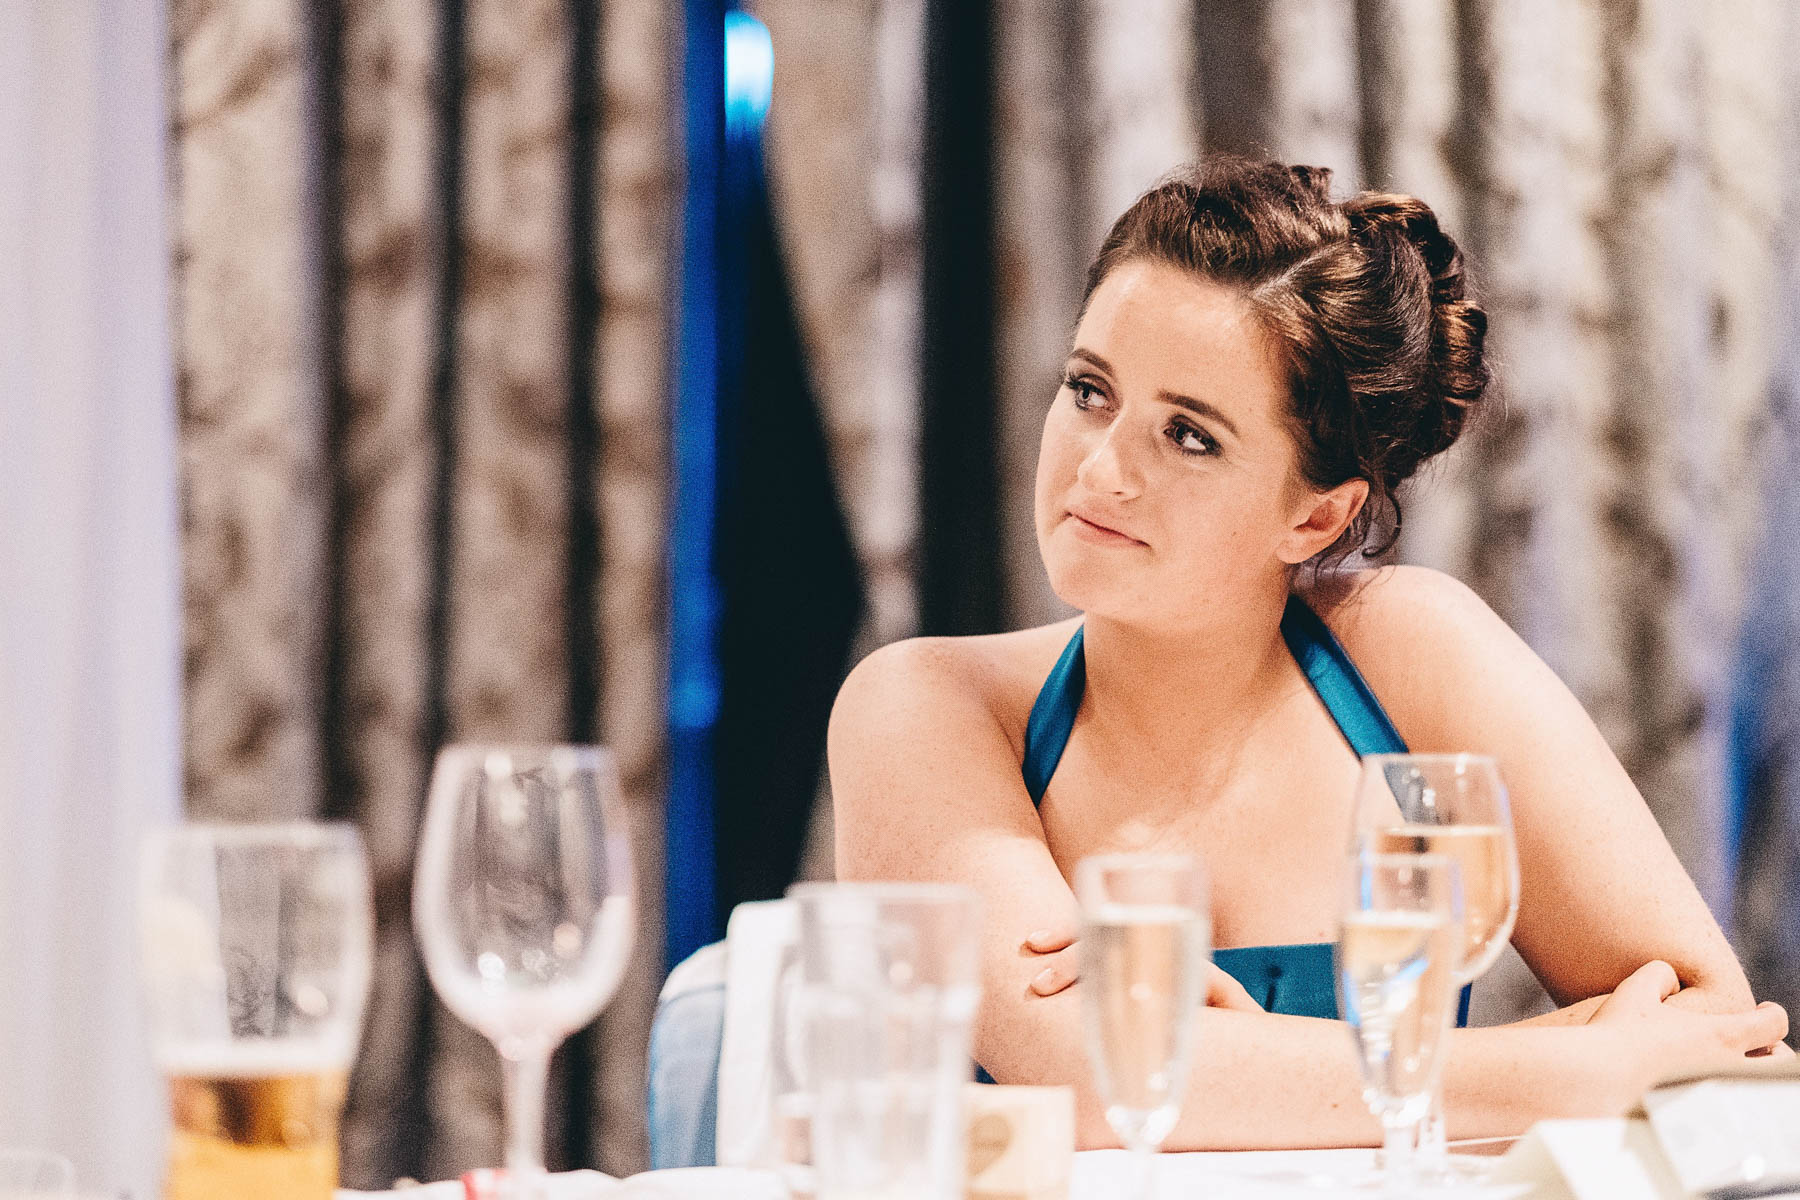 Bridesmaid looks on during speech